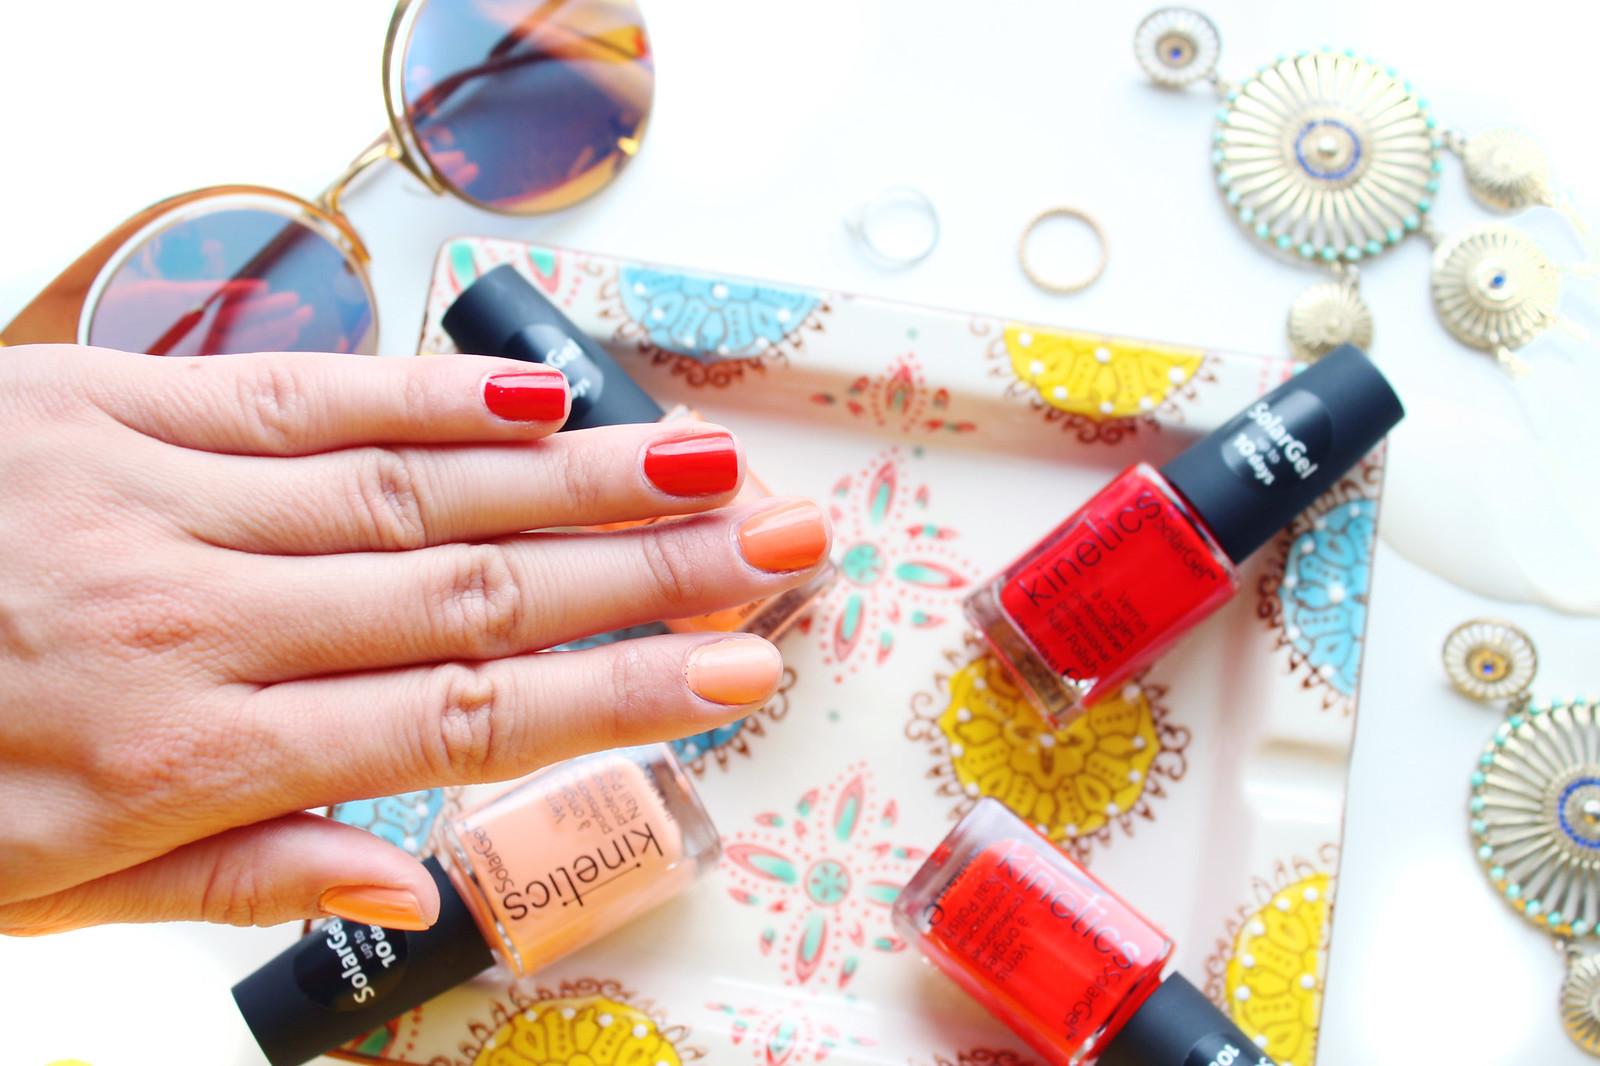 Kinetics Solargel manicure